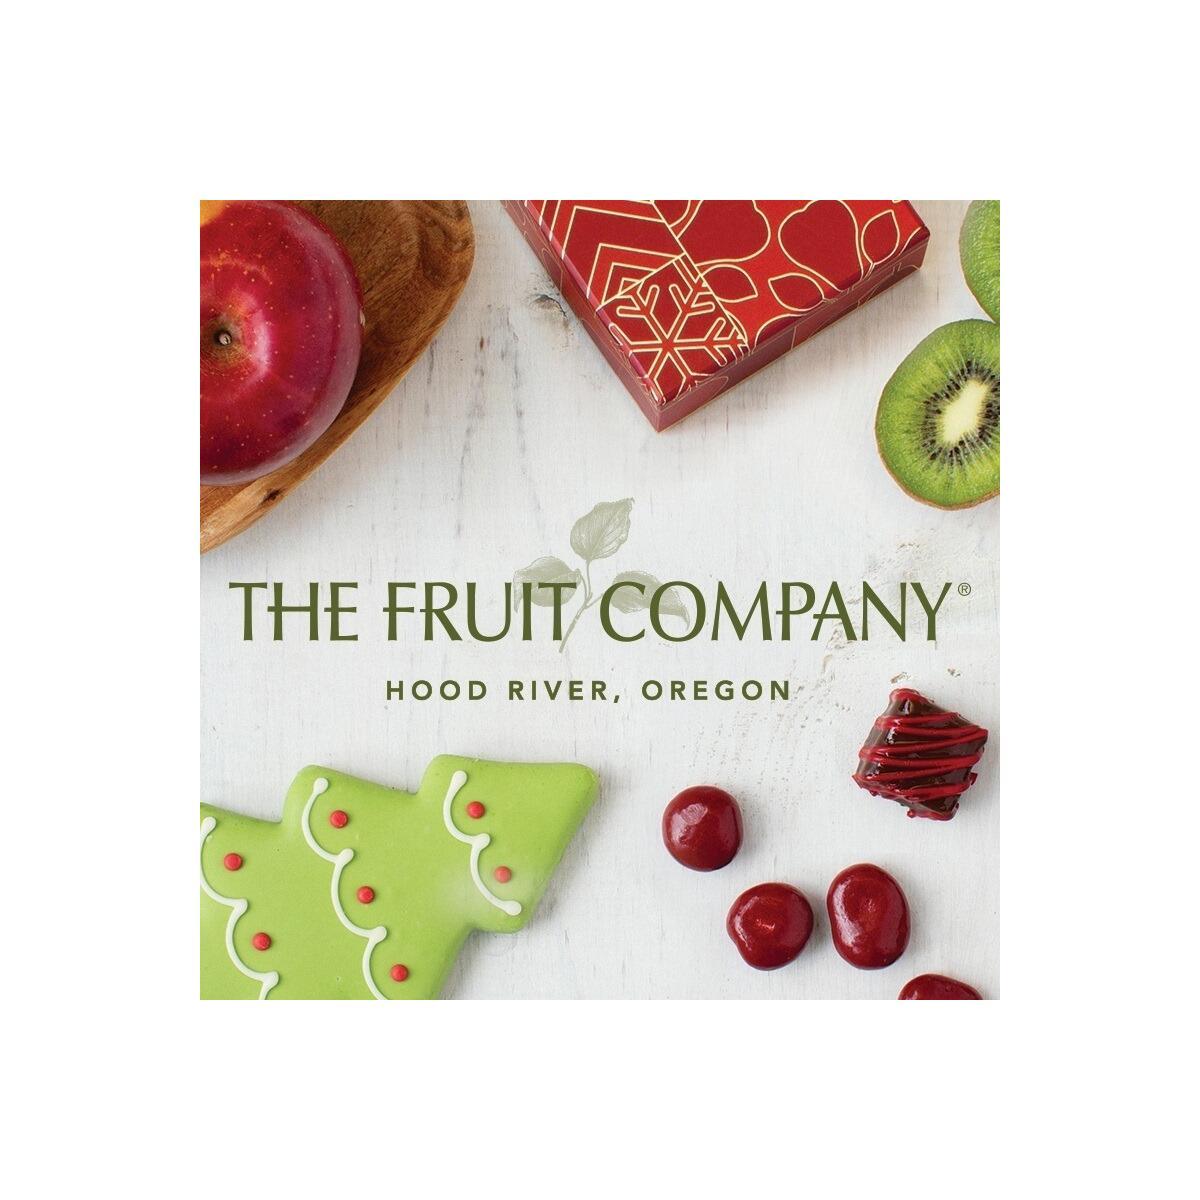 The Fruit Company